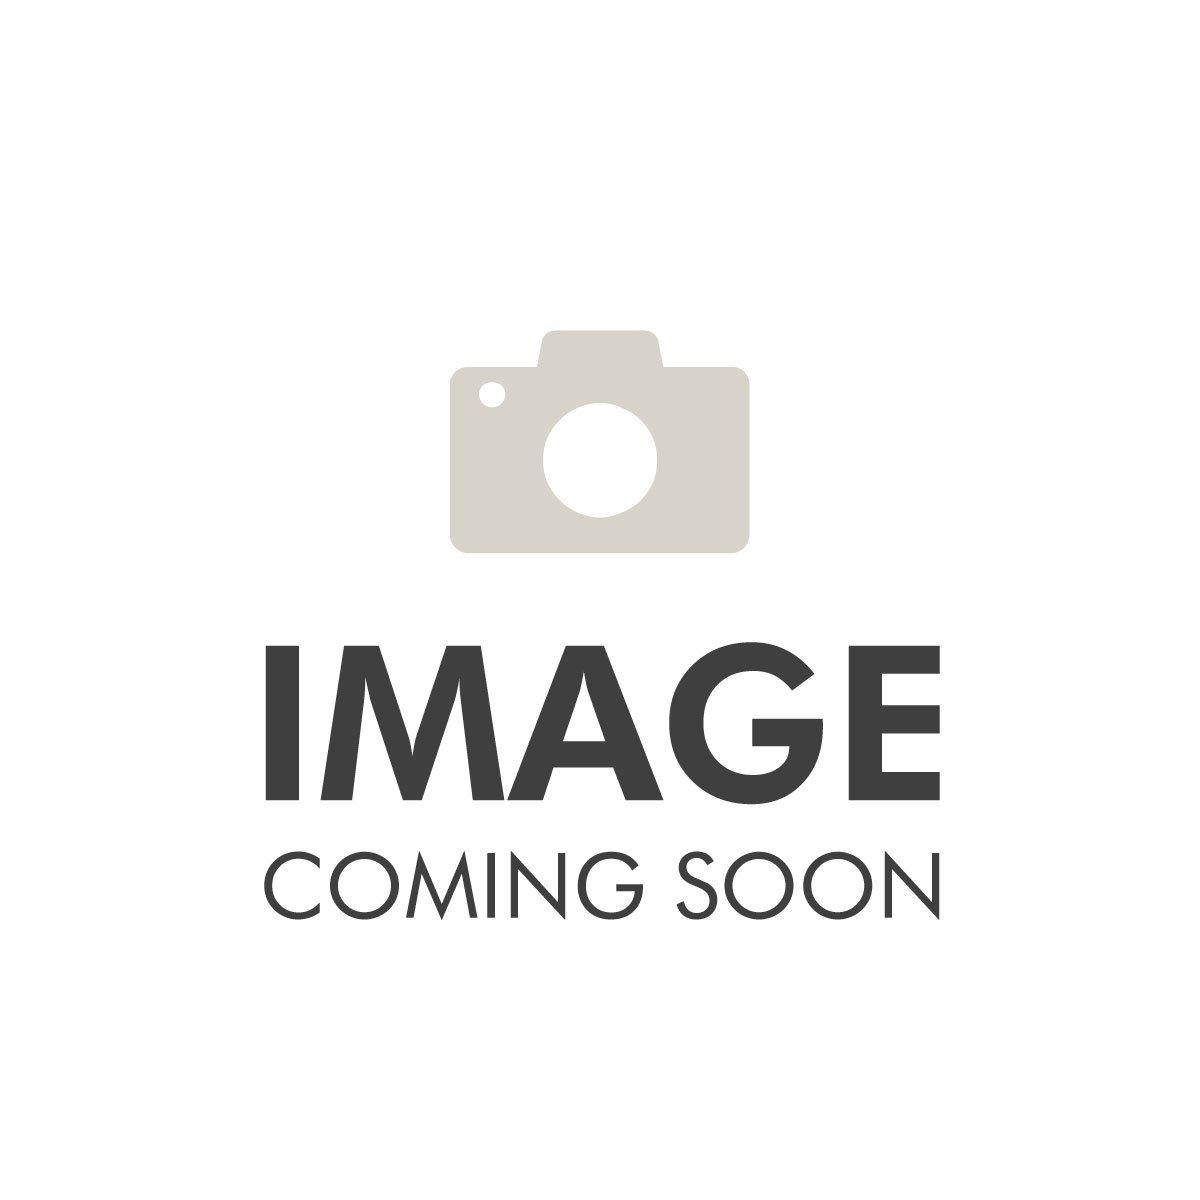 Calvin Klein Eternity Aqua 100ml EDT Spray